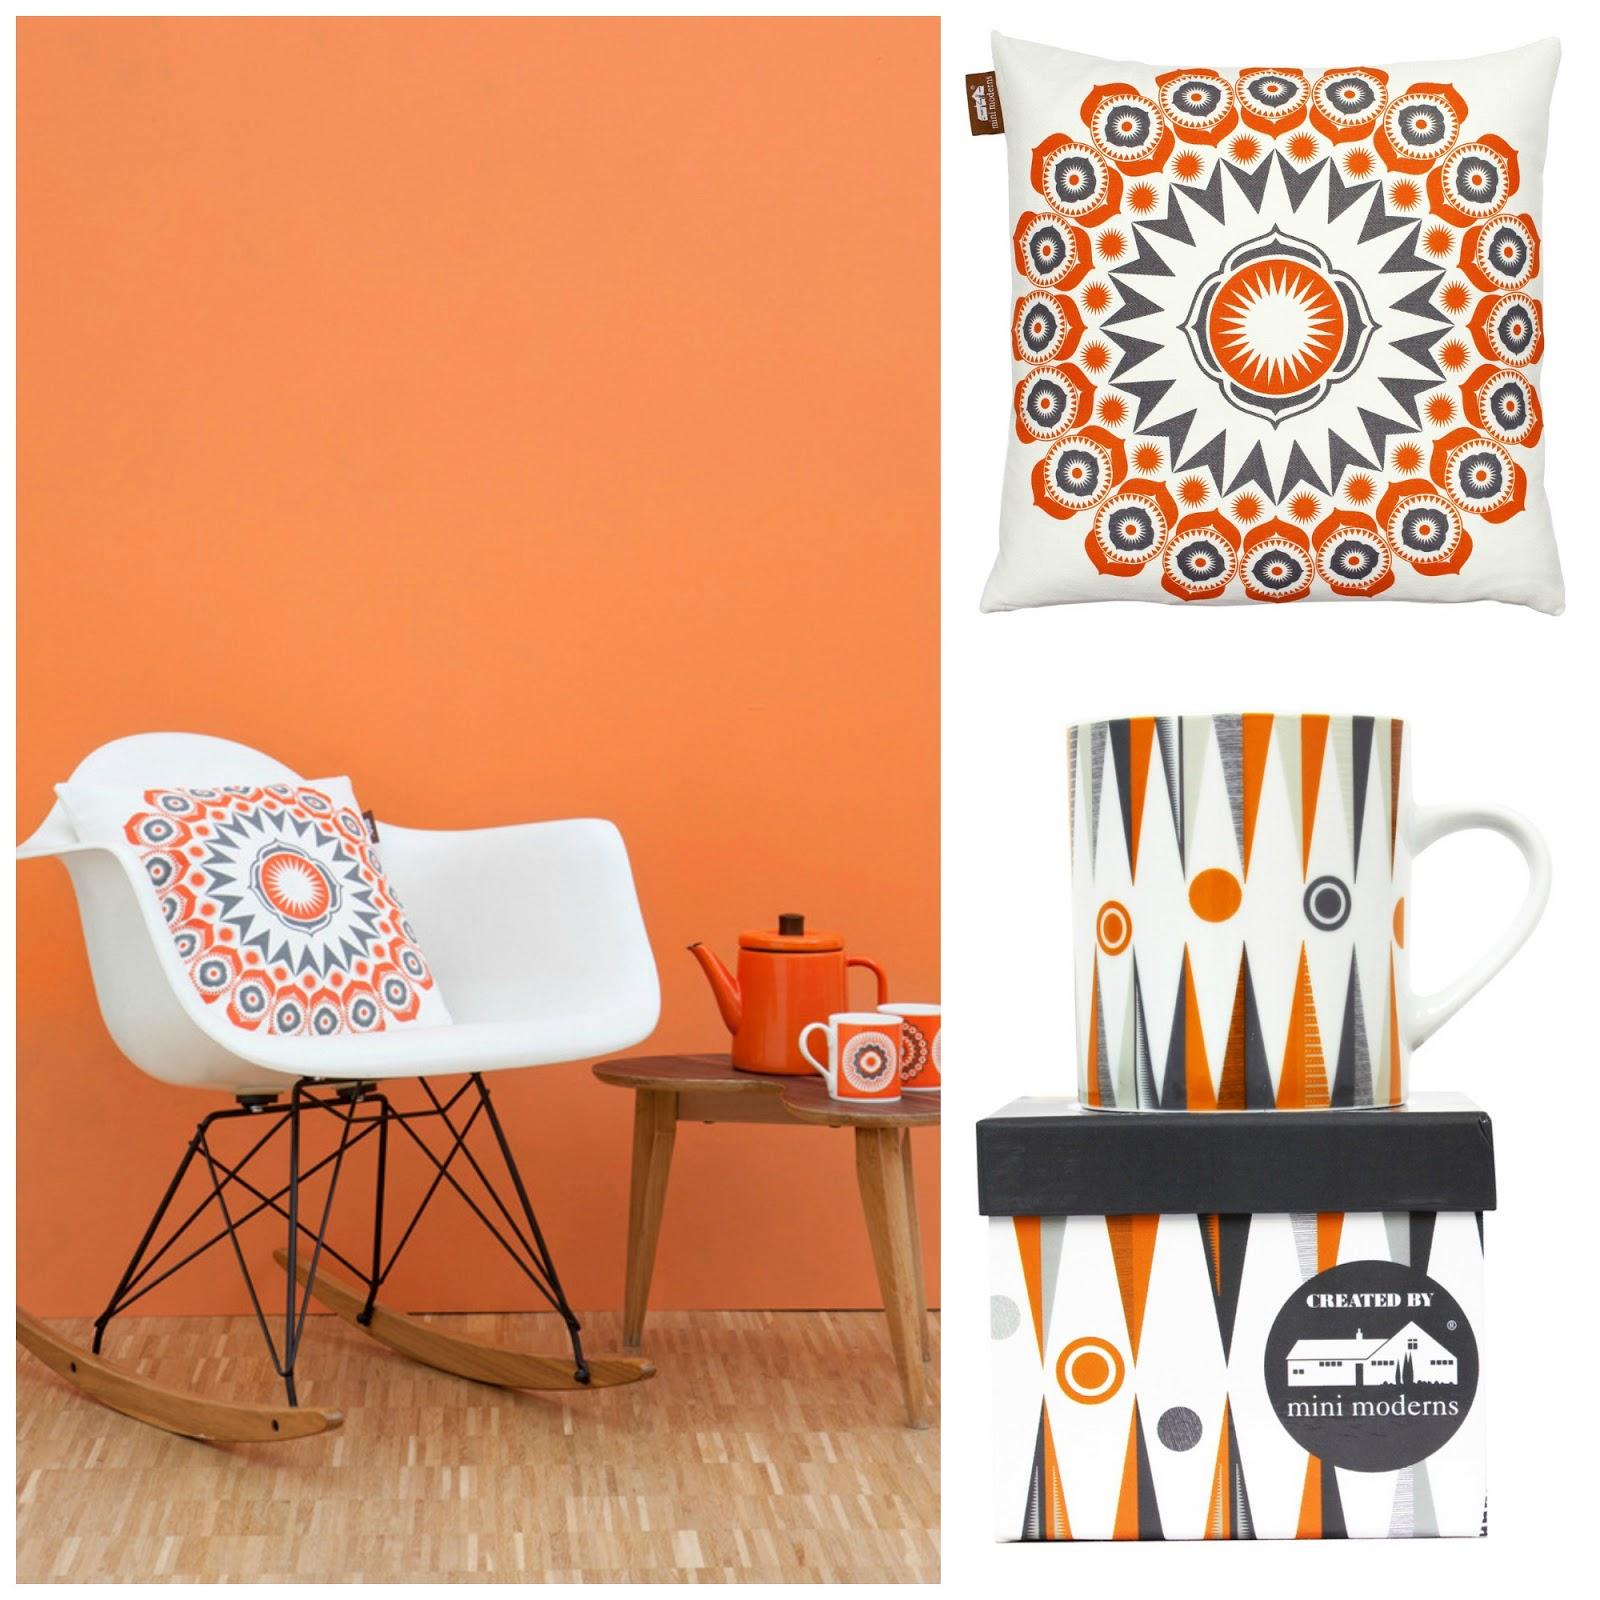 The Studio M Designs Blog Talk Shop Mini Moderns